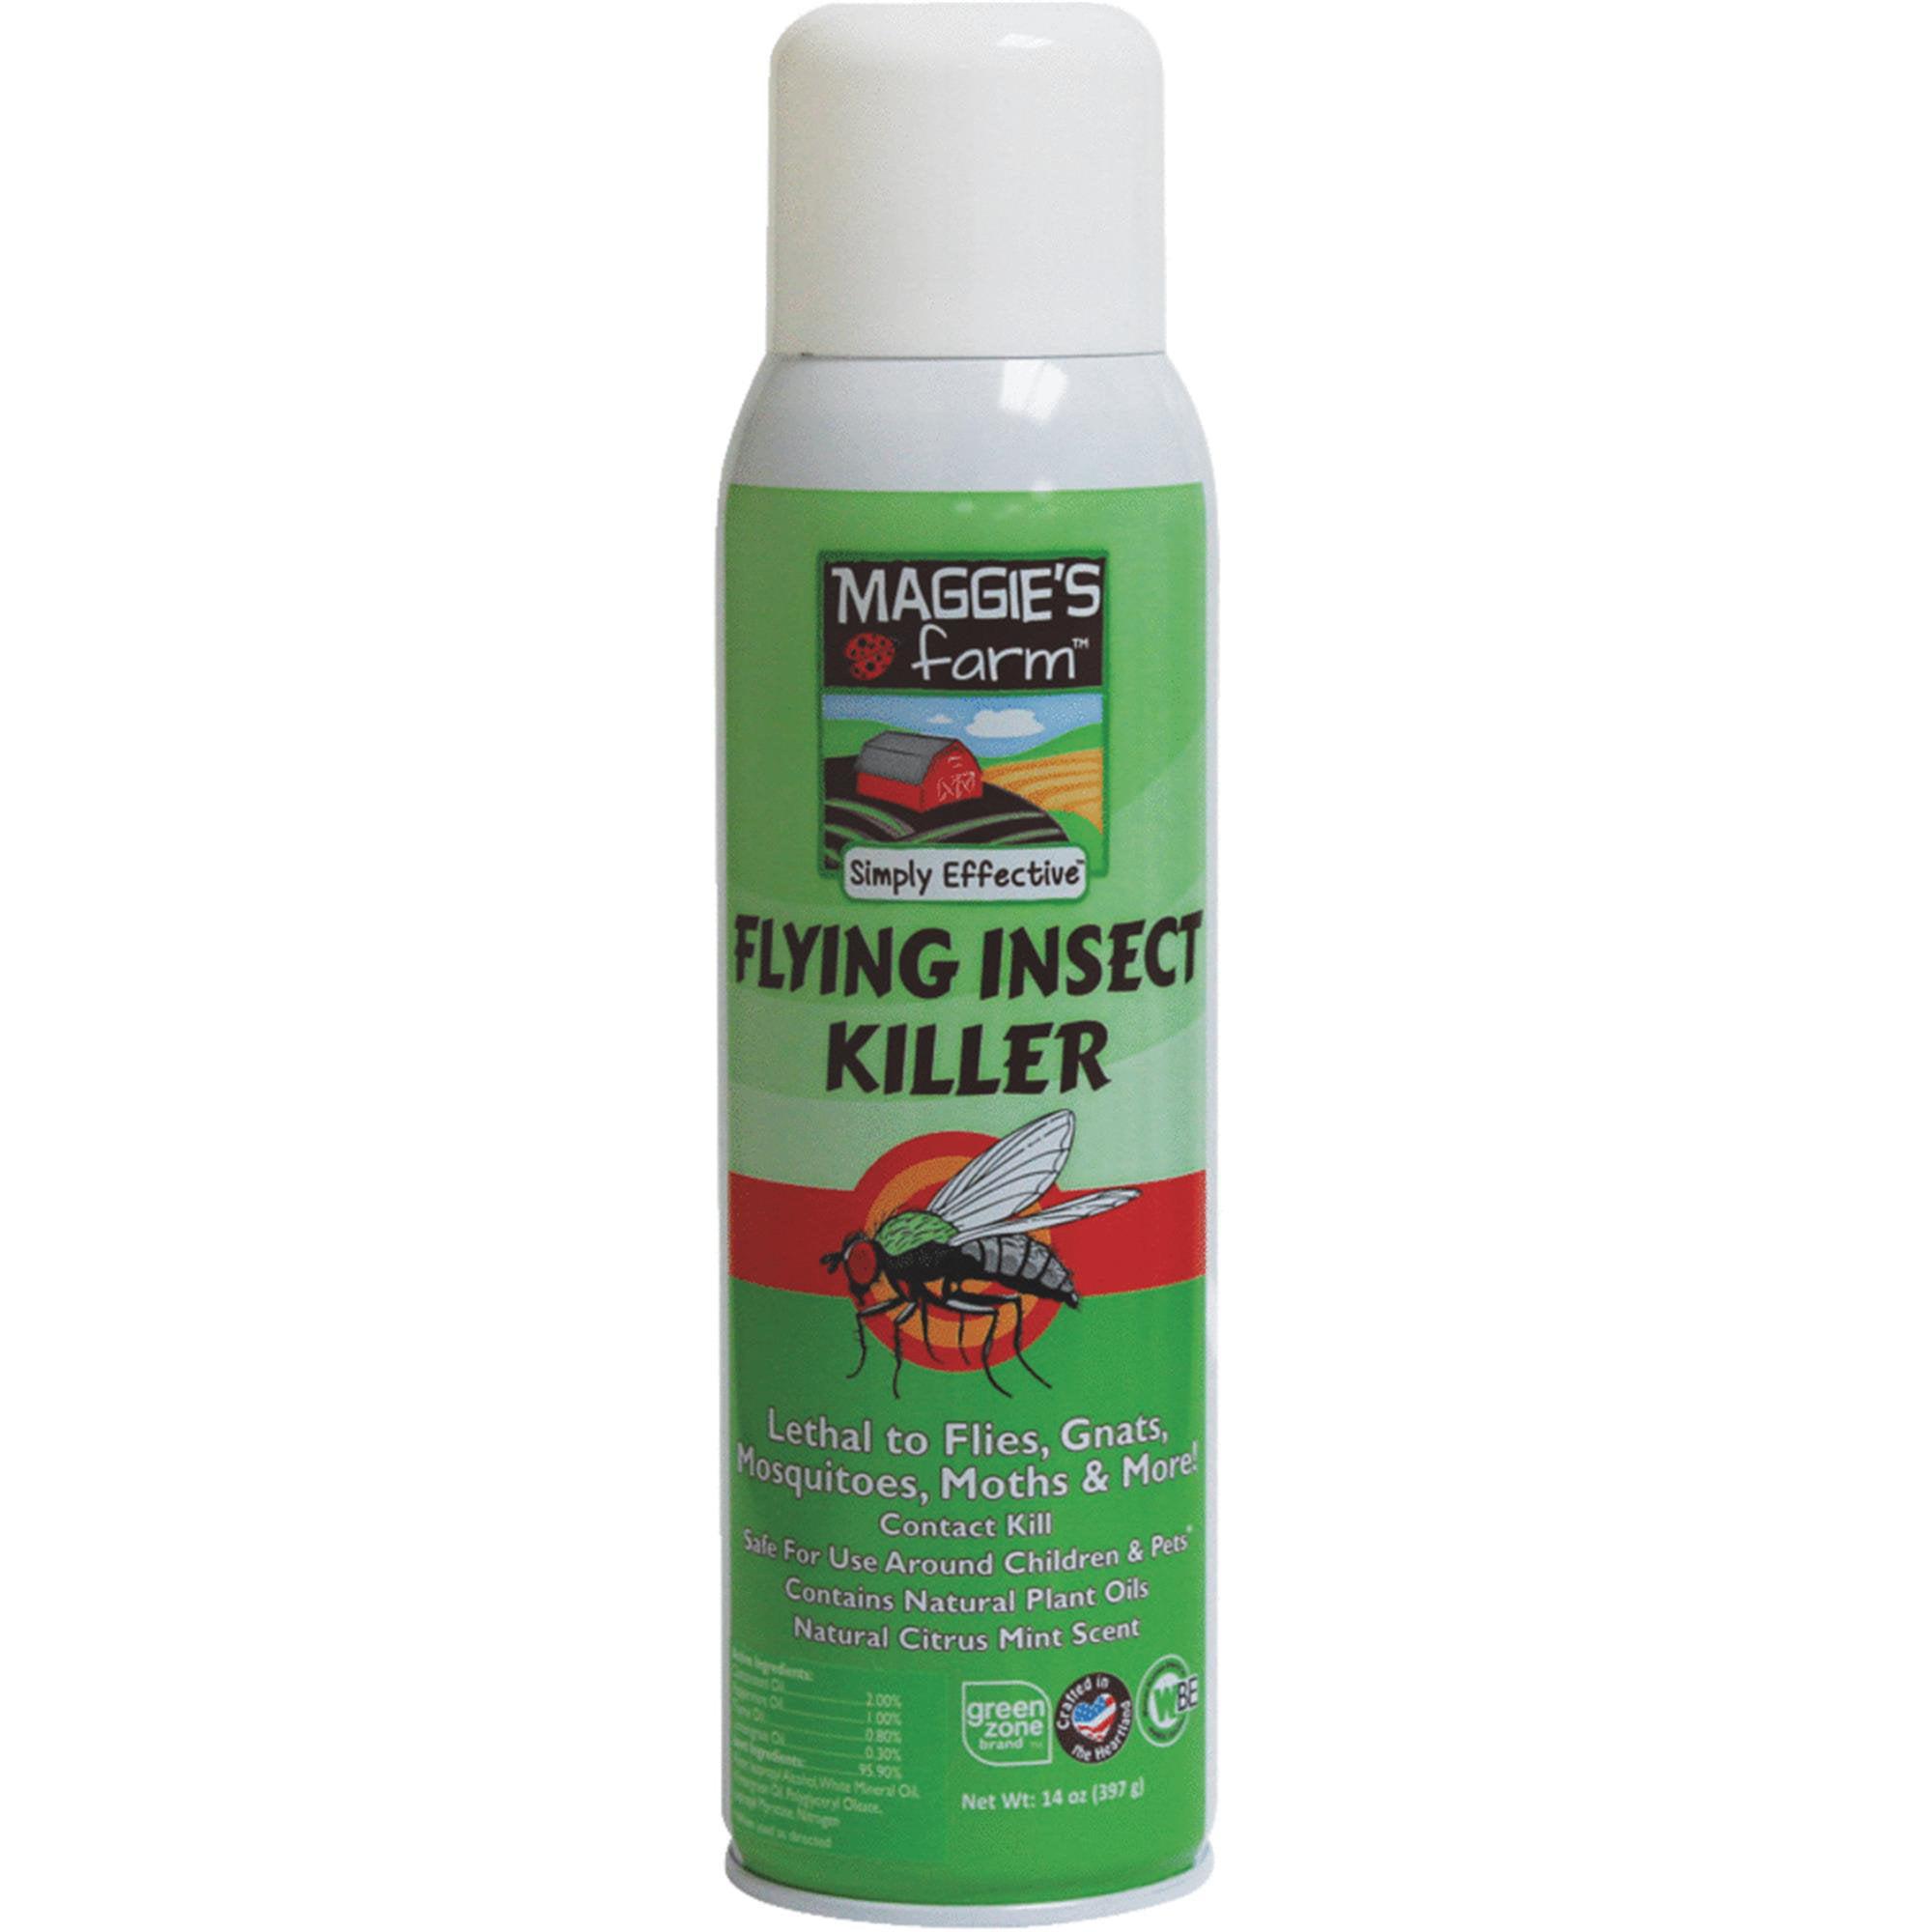 Maggie\'s Farm Flying Insect Killer - Walmart.com